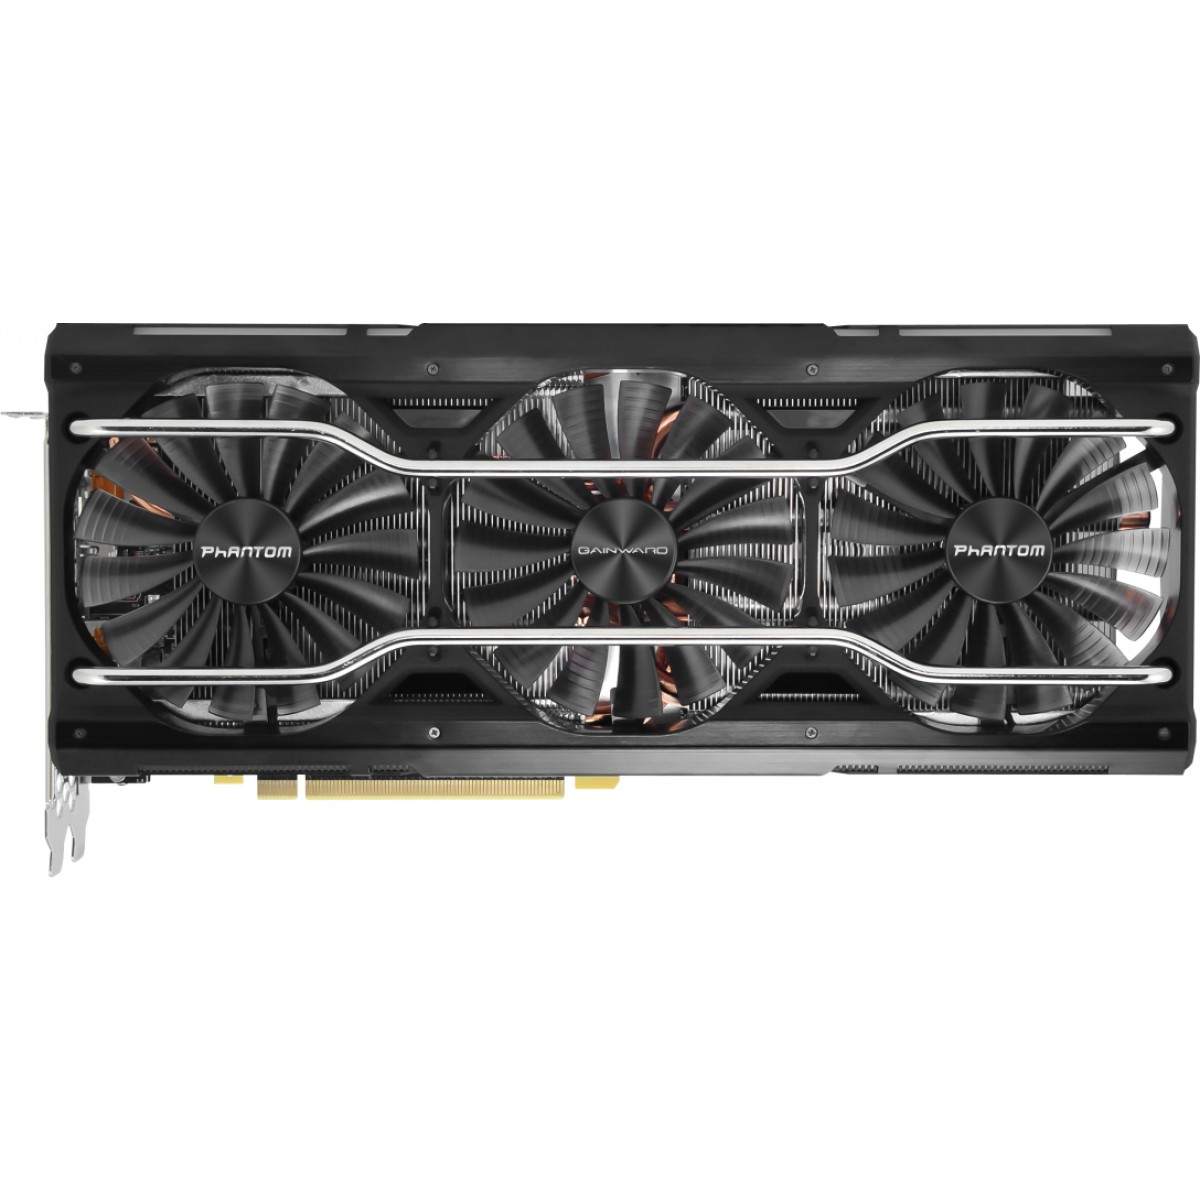 Placa de Vídeo Gainward GeForce RTX 2080 Super Phantom, 8GB GDDR6, 256Bit, NE6208S020P2-1040P